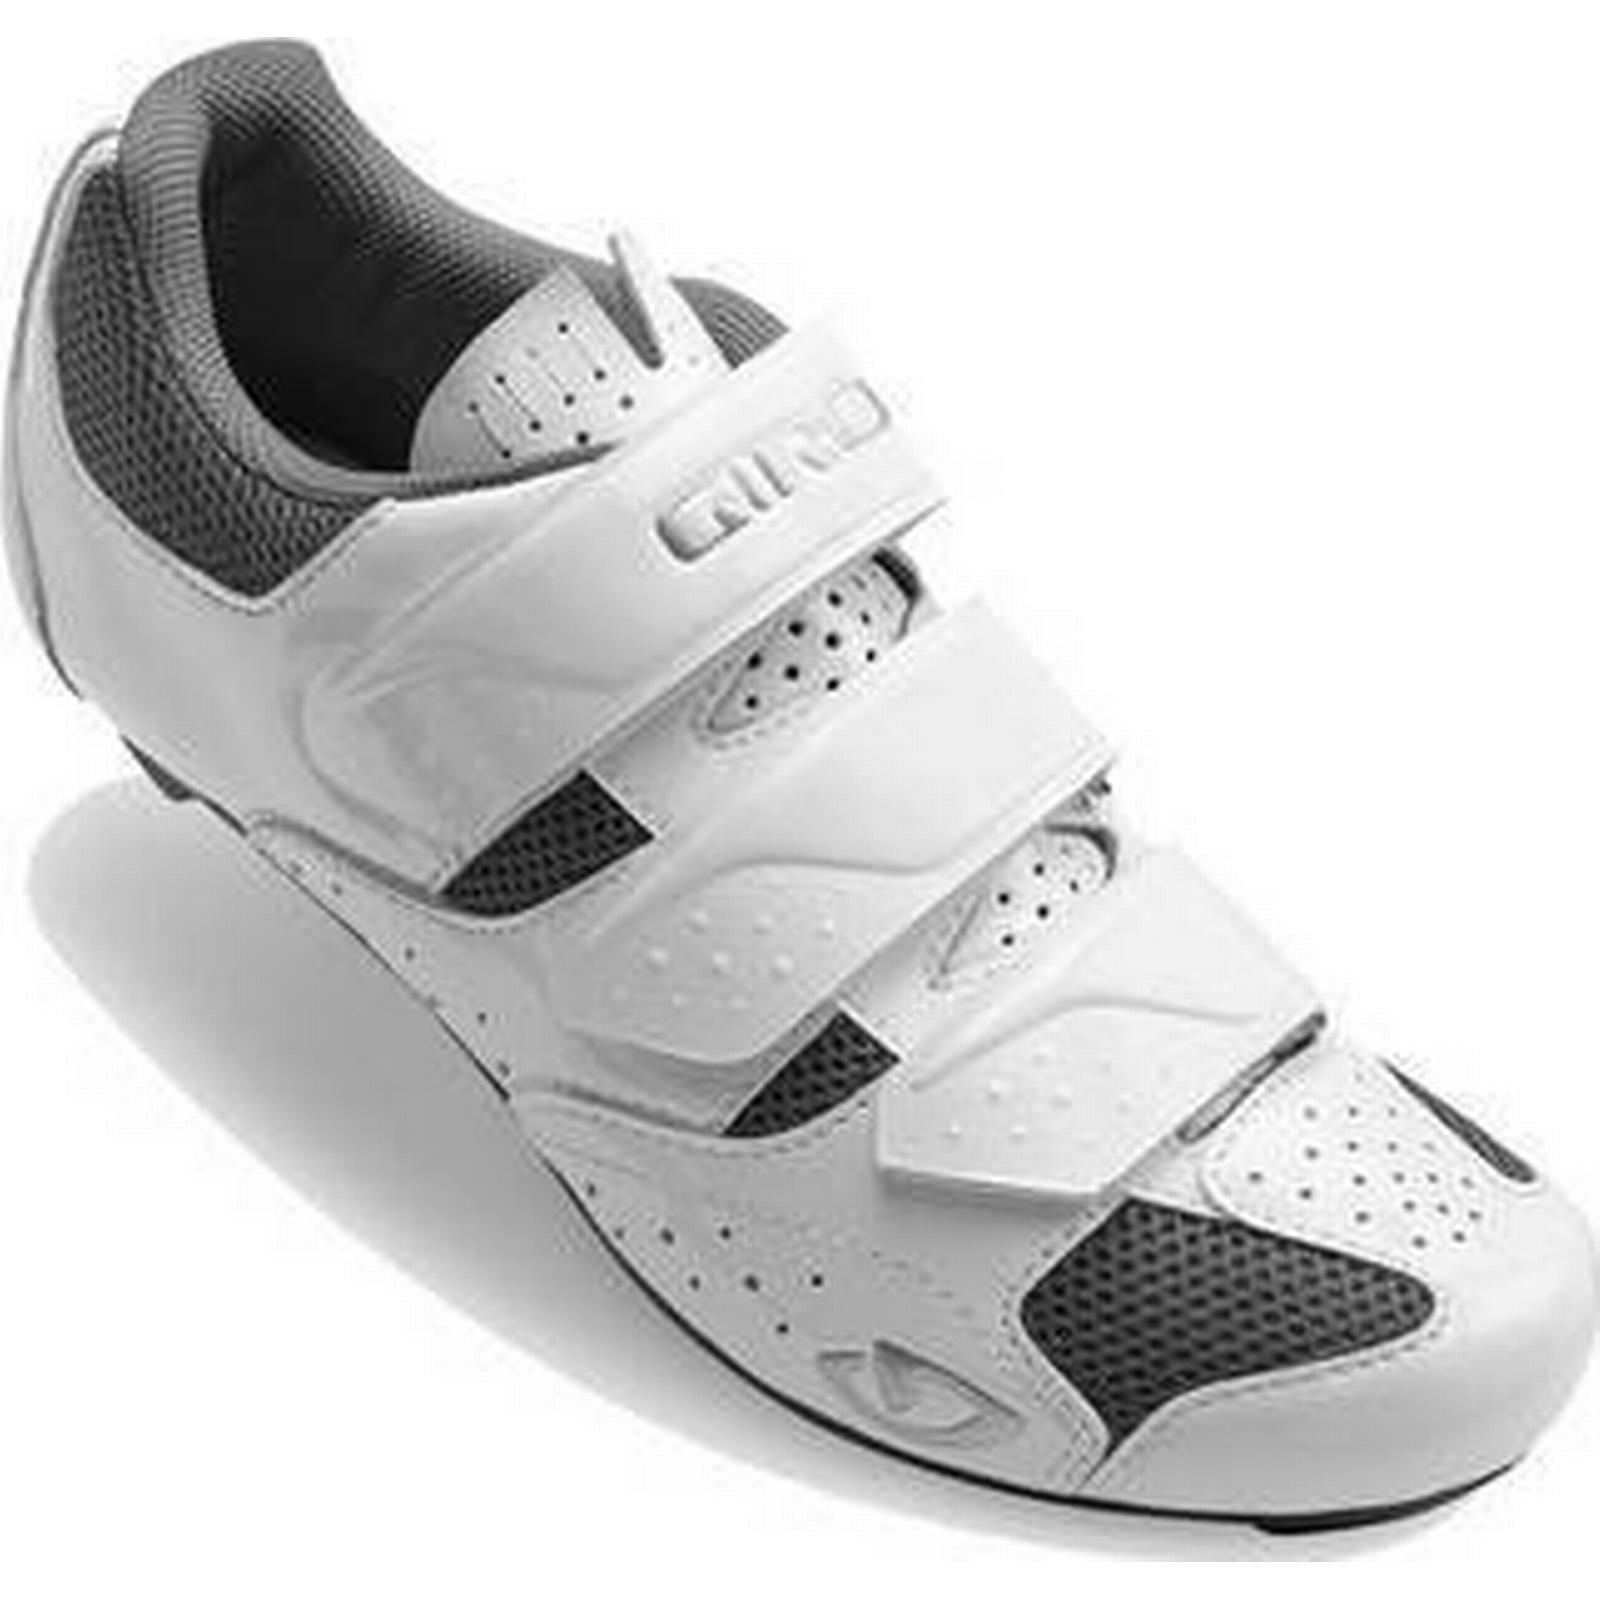 Giro Techne | Women's Road Cycling Shoes | Techne White/Silver - 38 90ad6f